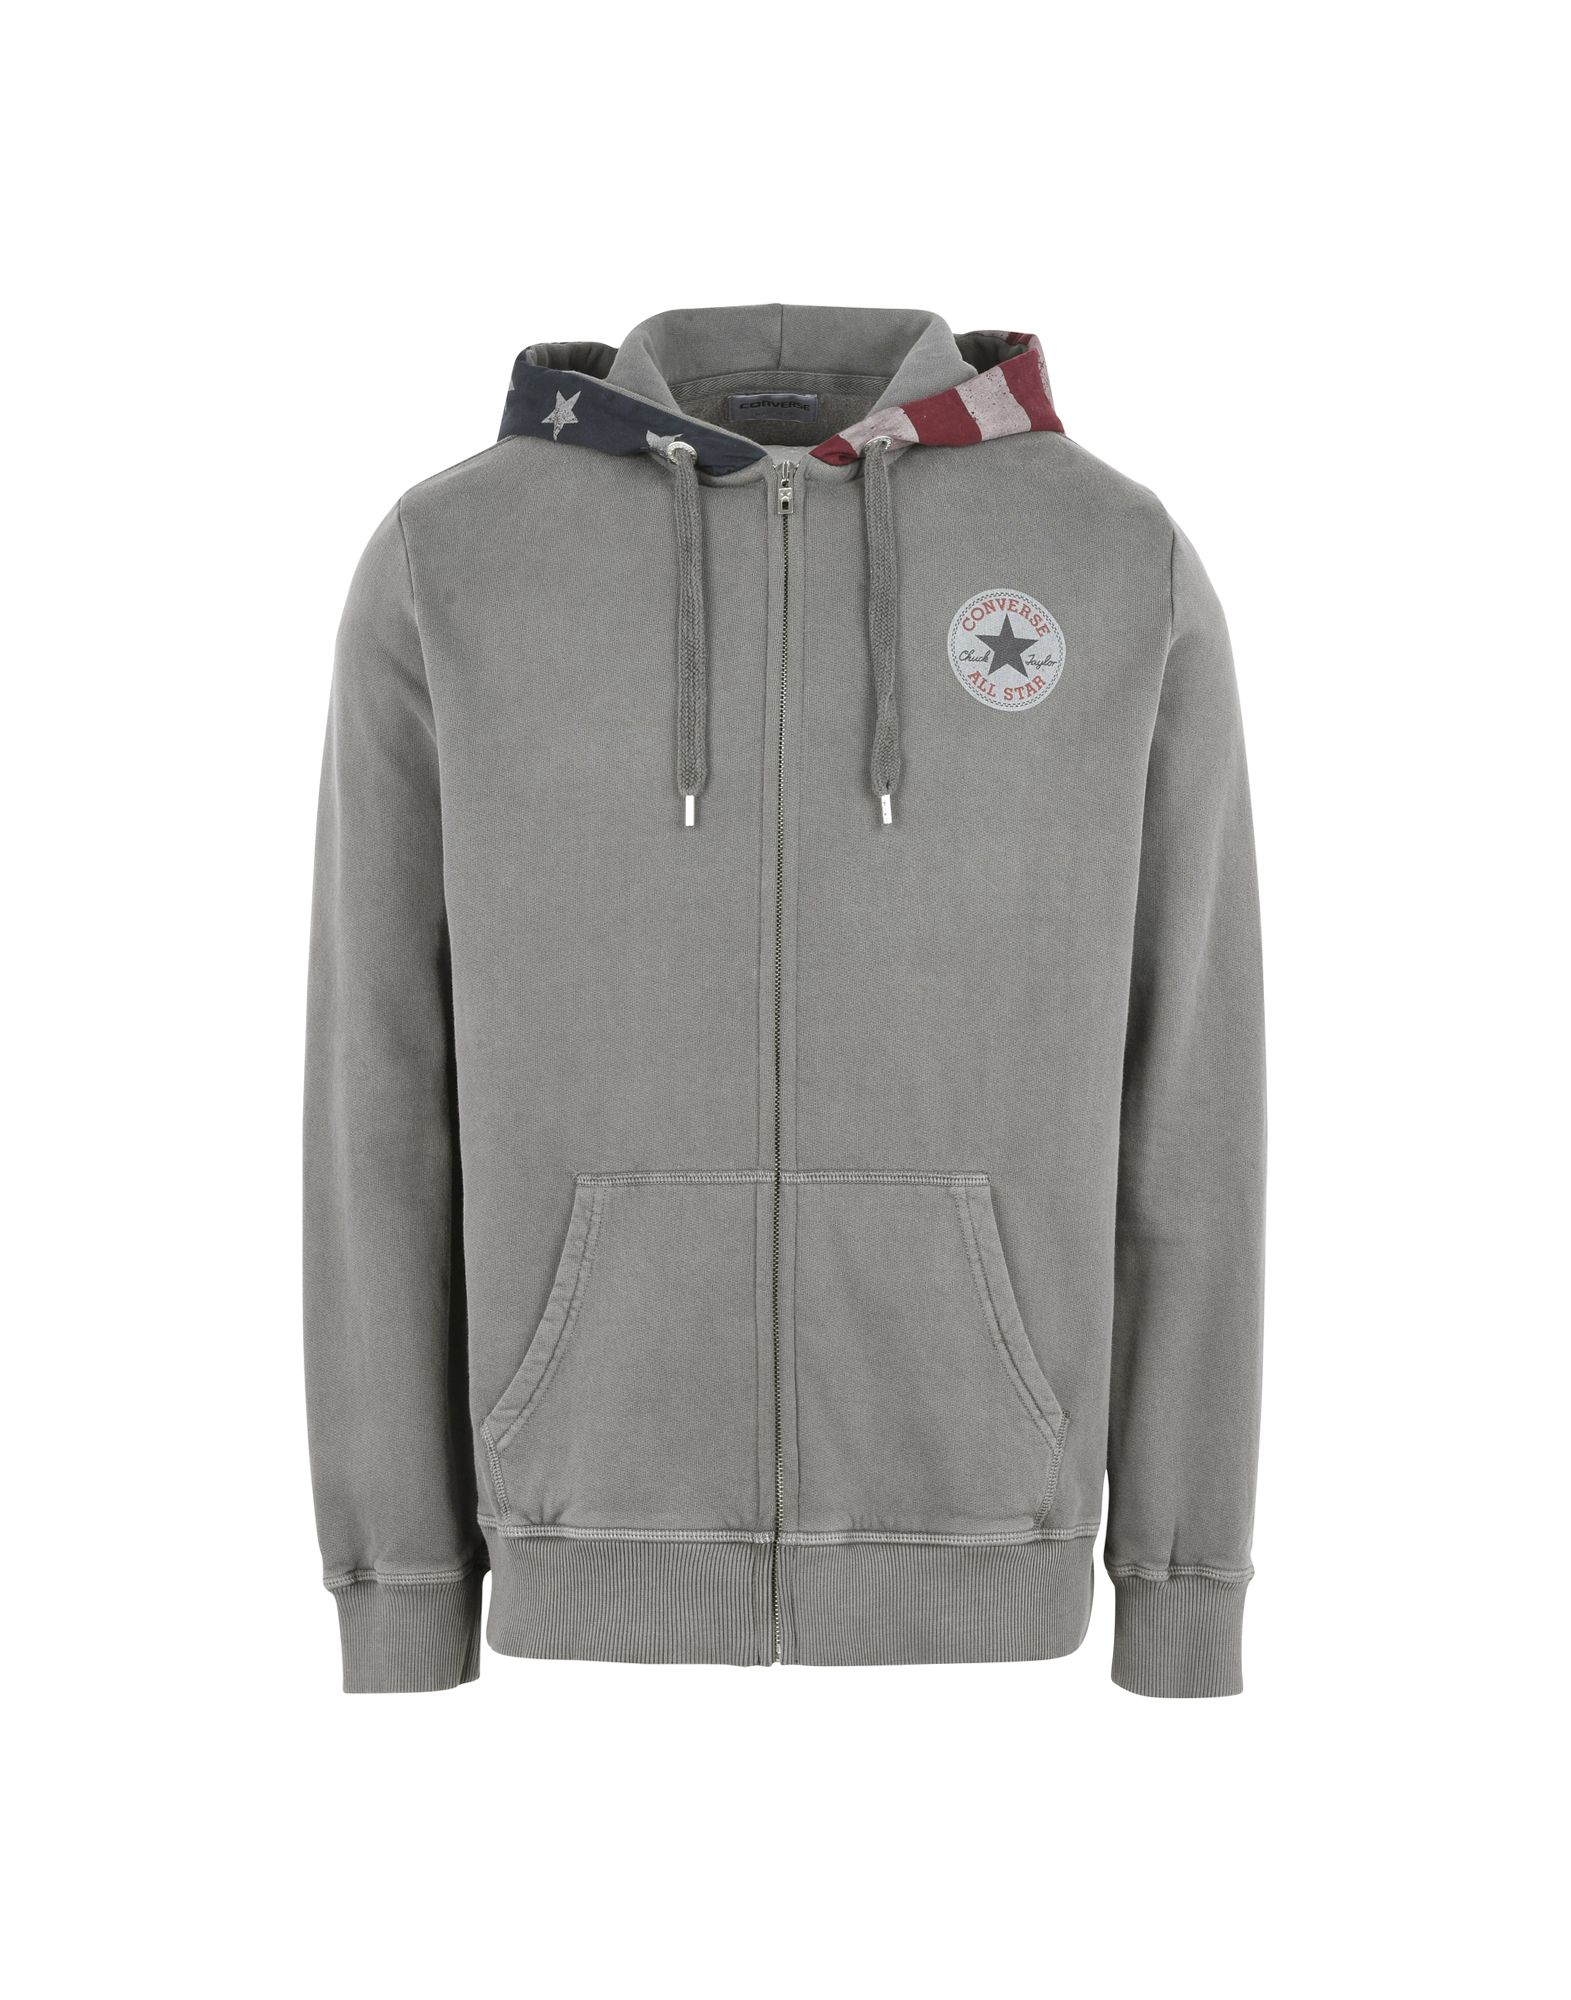 CONVERSE ALL STAR Herren Sweatshirt Farbe Grau Größe 6